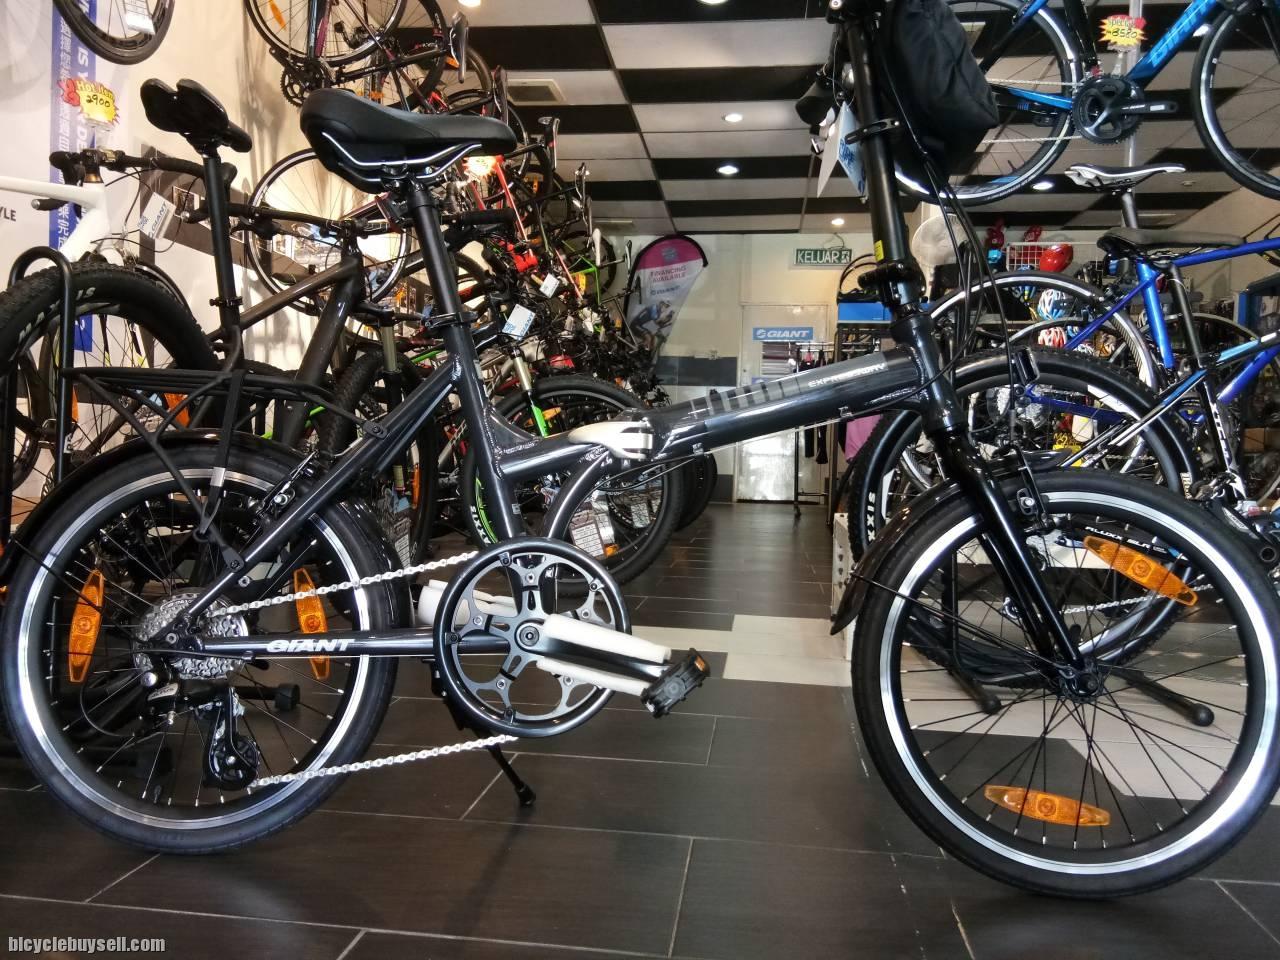 d6b2ebd3660 New Giant Expressway 1 Premium Folding Bike